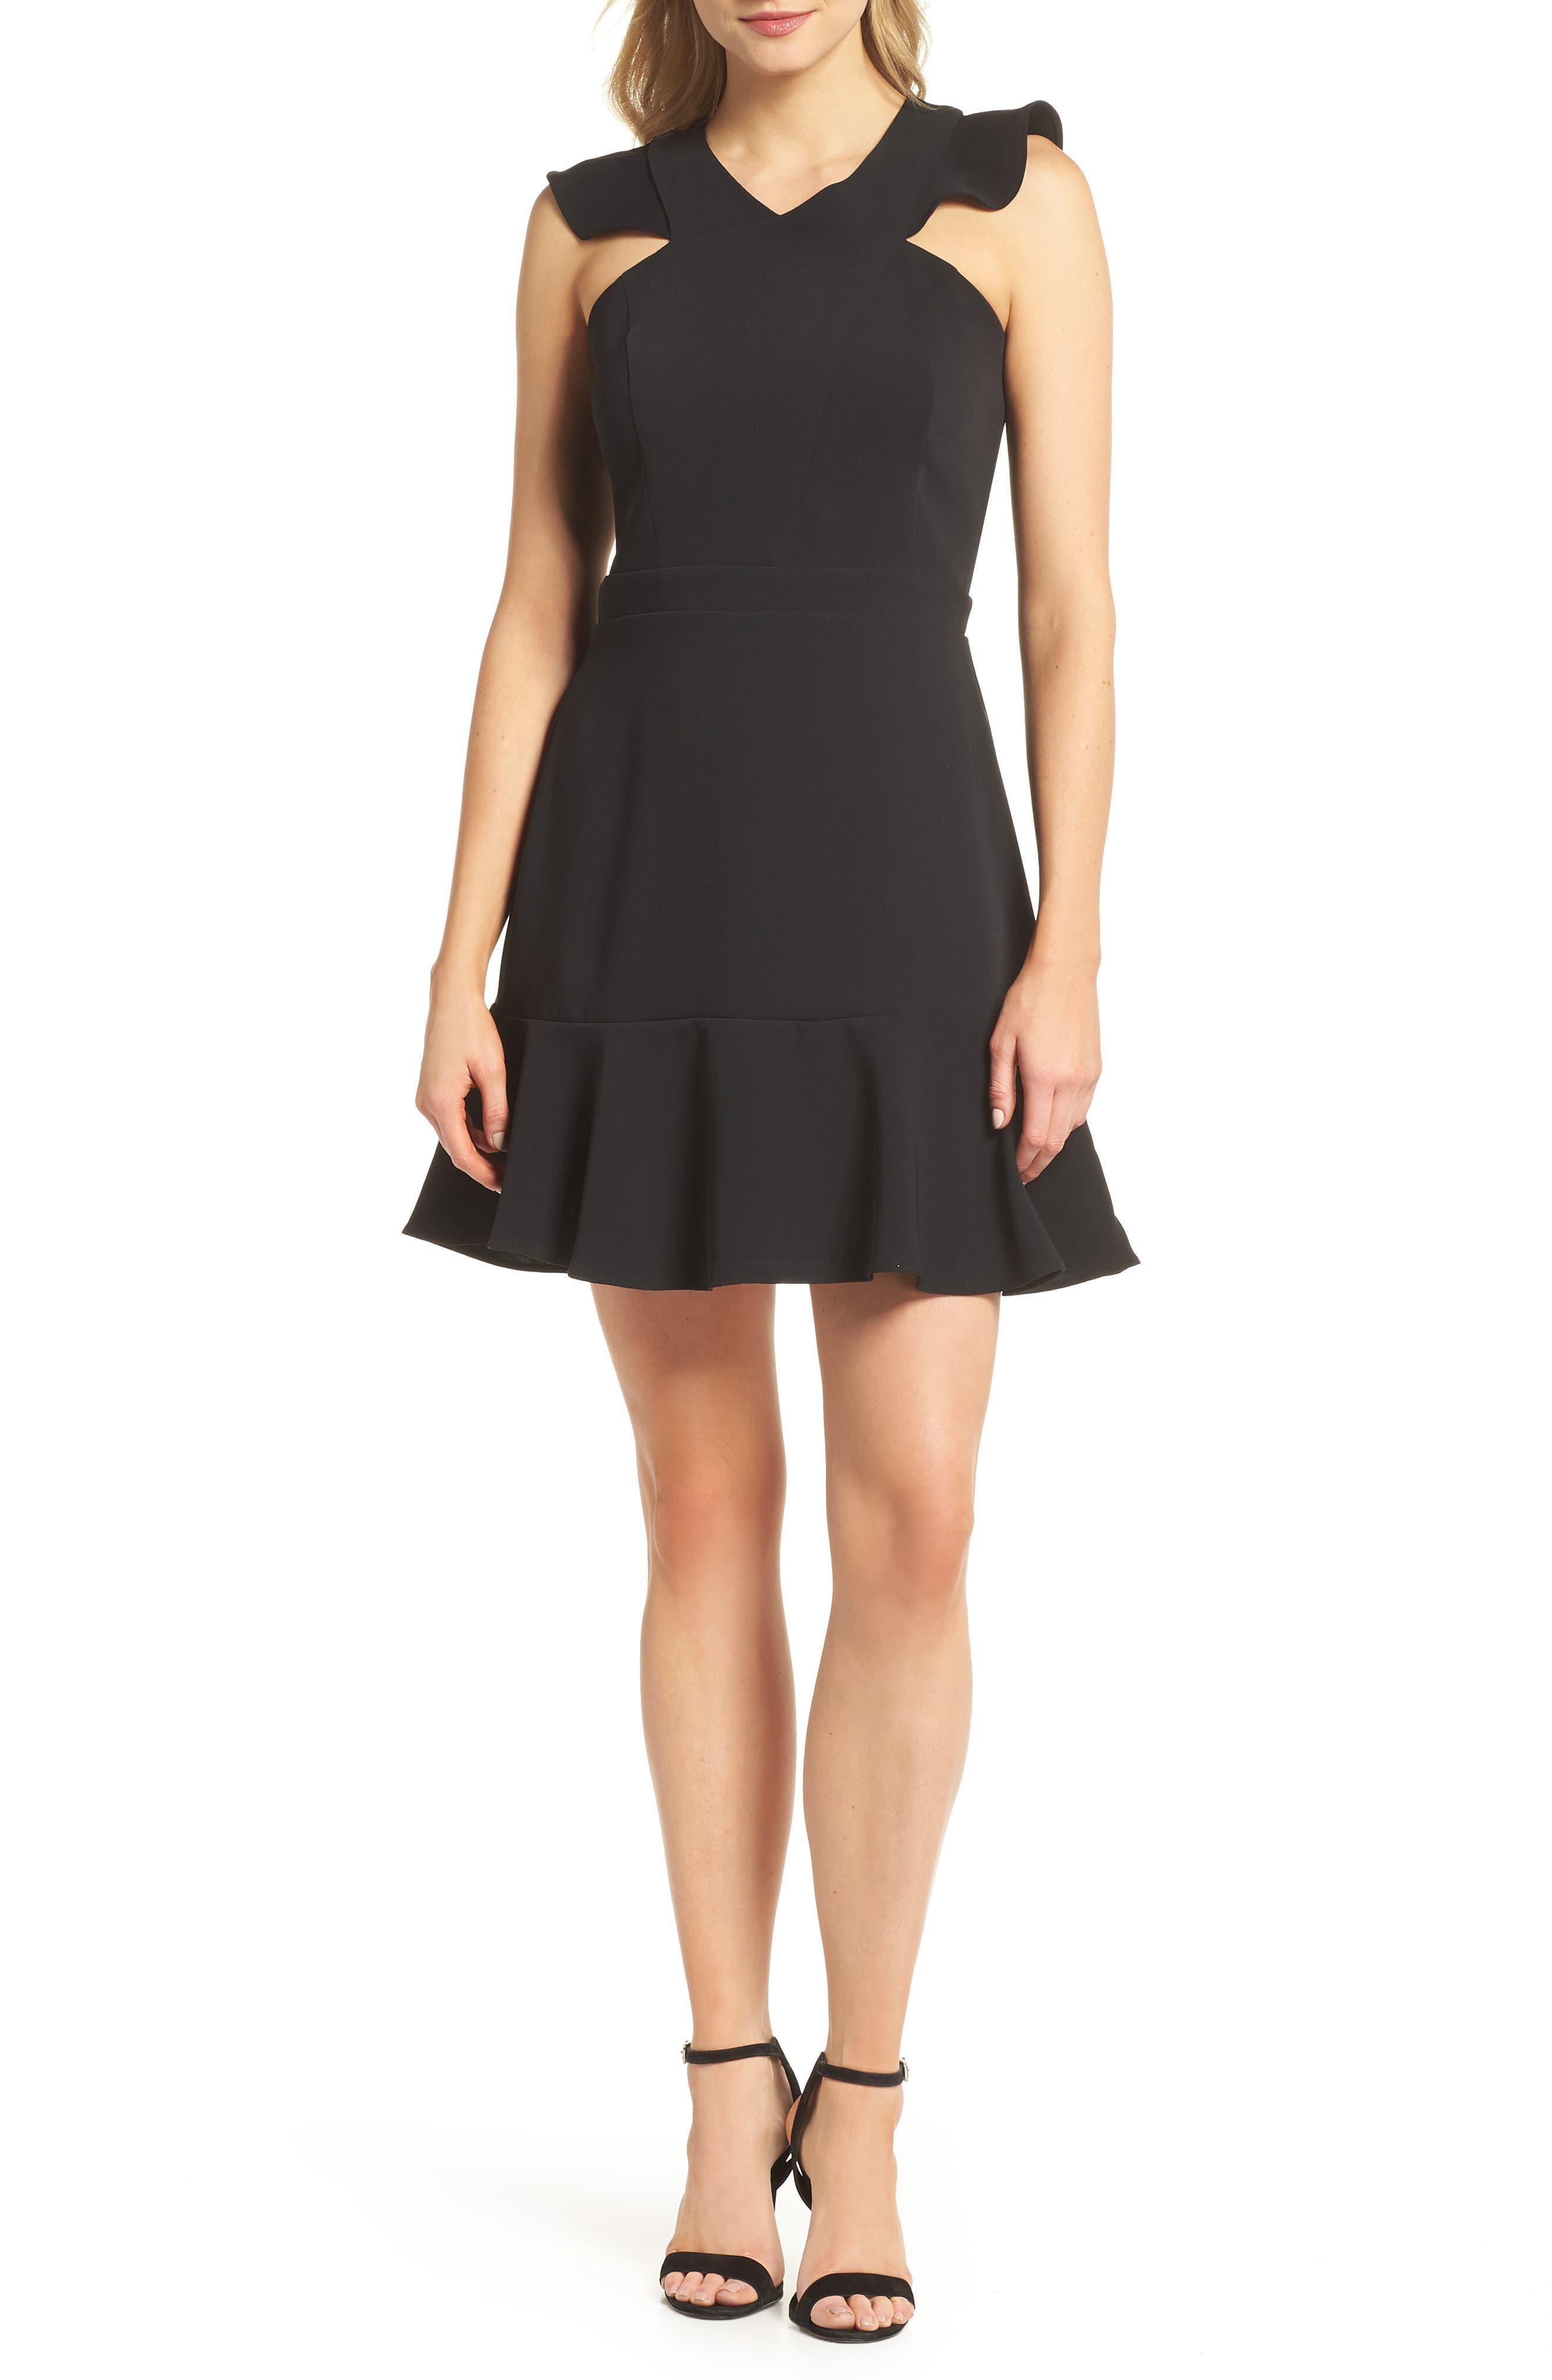 Chelsea28 Cross Front Ruffle Fit & Flare Dress, Black